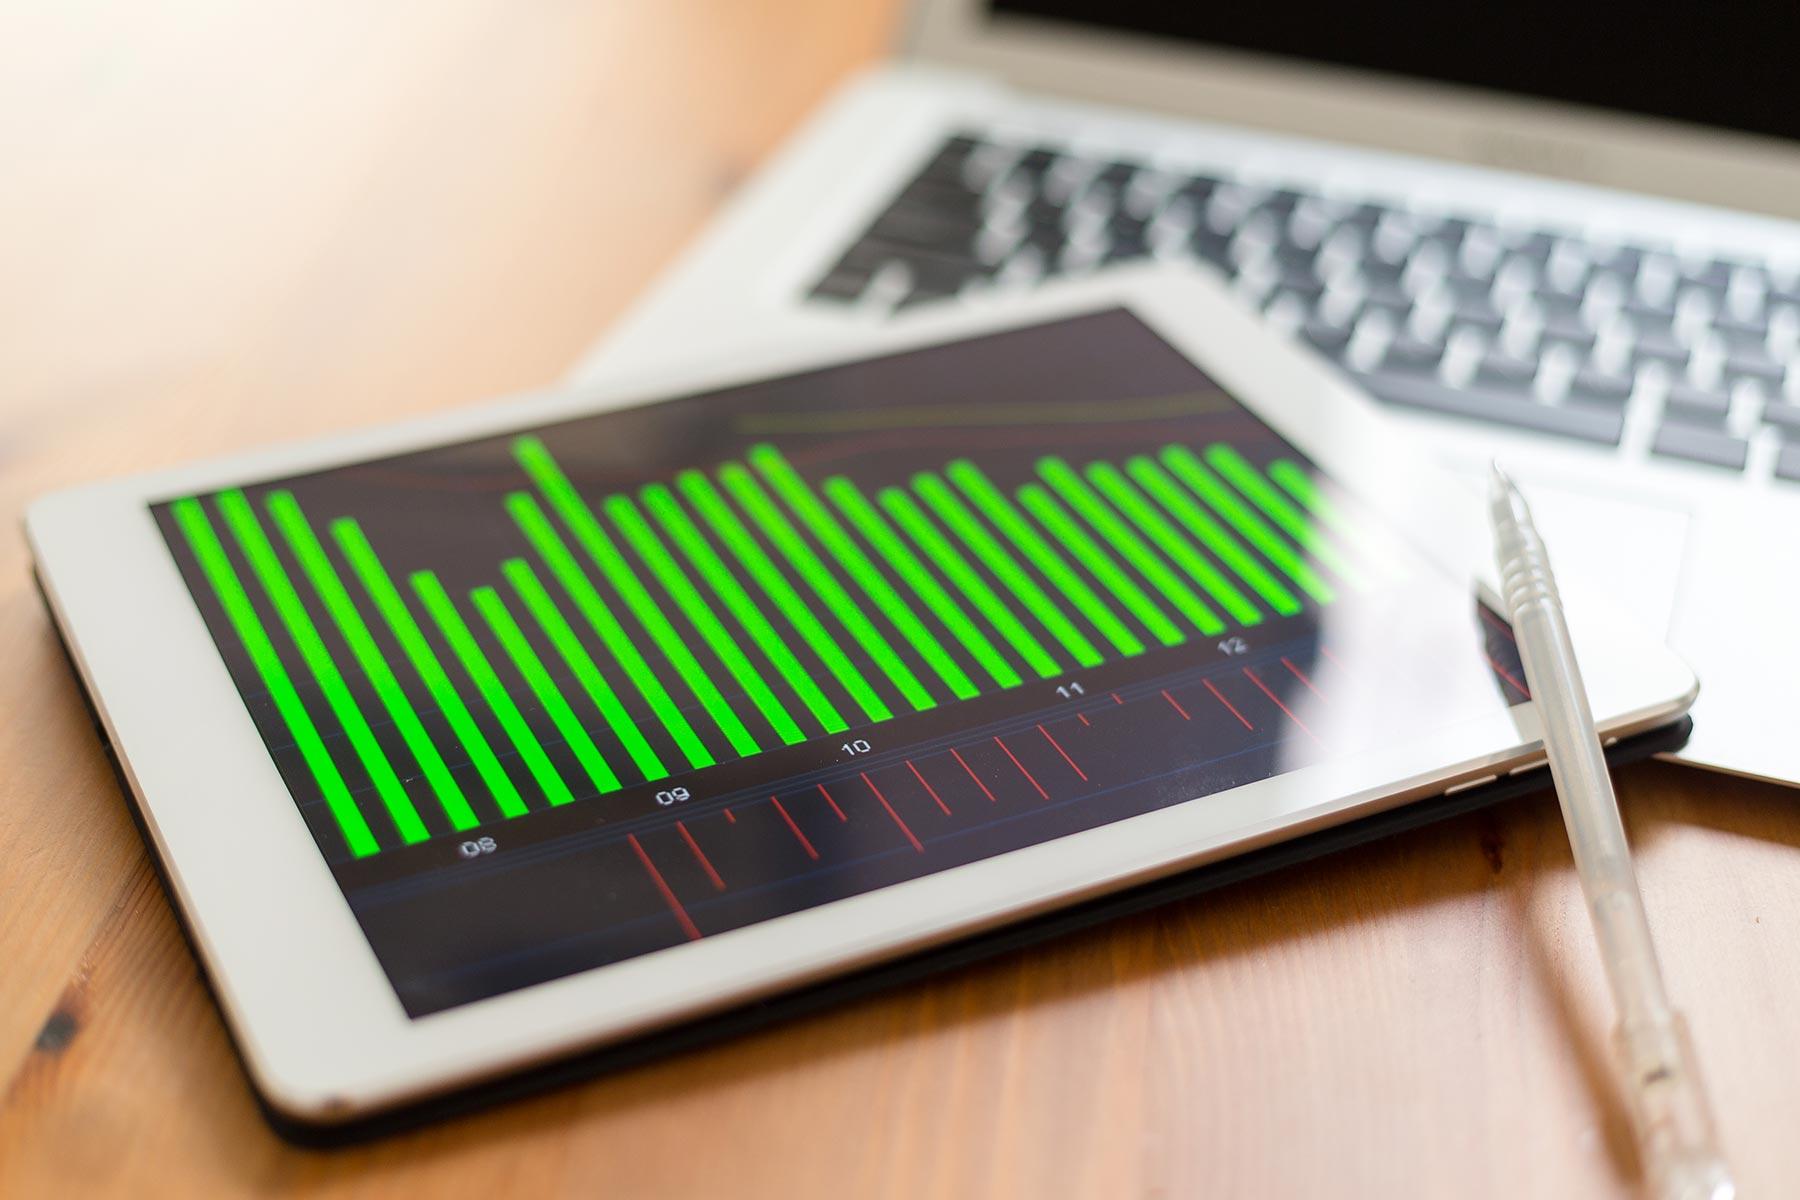 digital-tablet-showing-charts-8HHJNQK.jpg